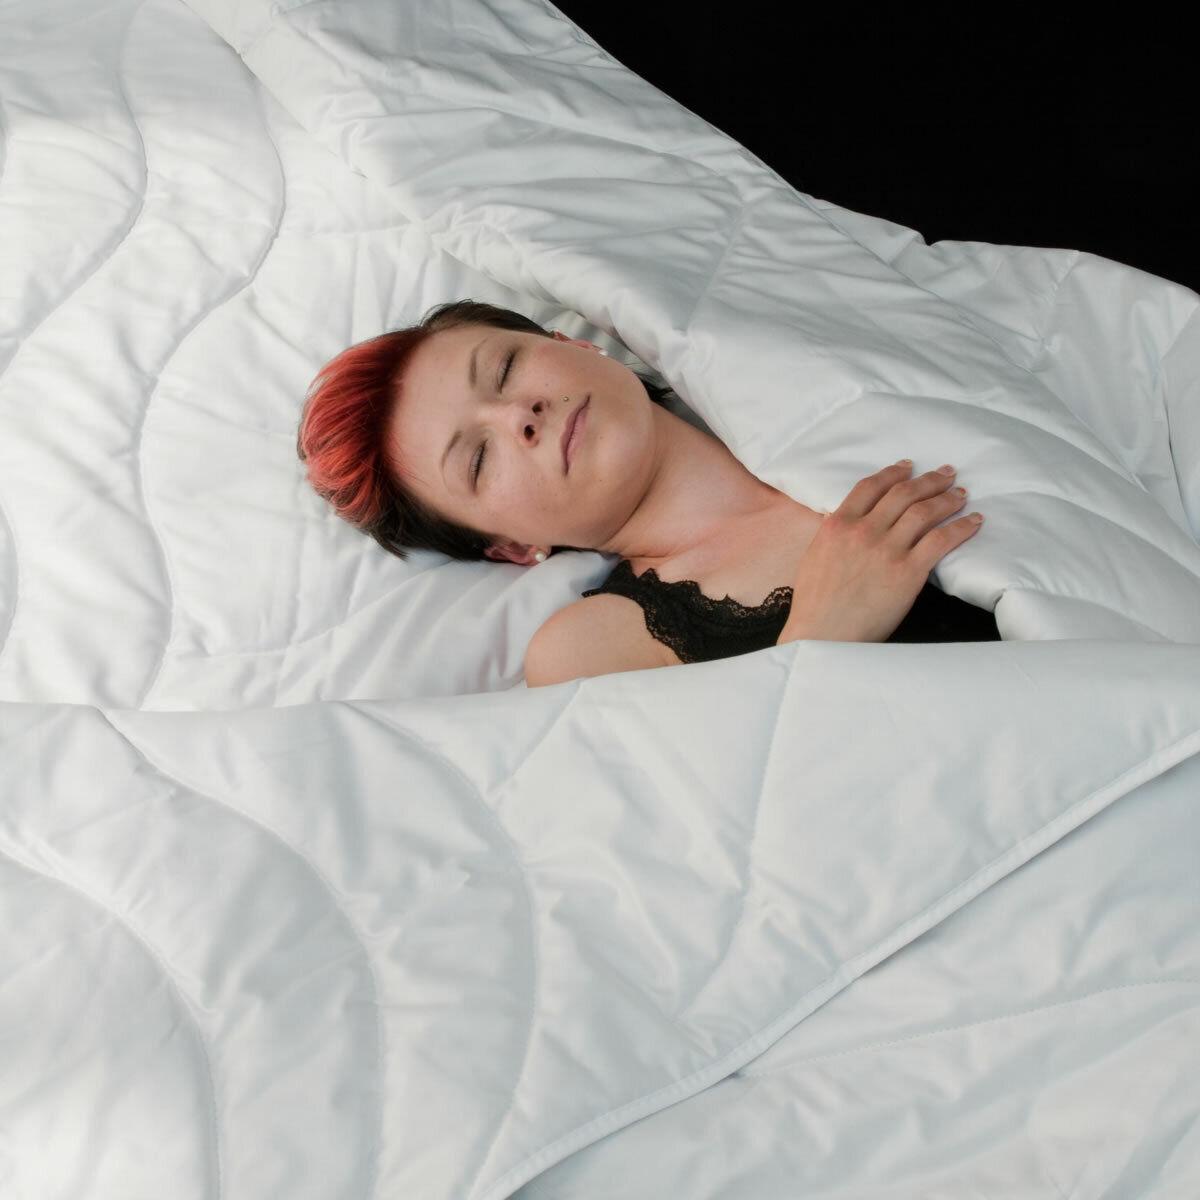 100% Wildseide extra leichte Sommerdecke dünnes Sommerbett Seide Decke waschbar